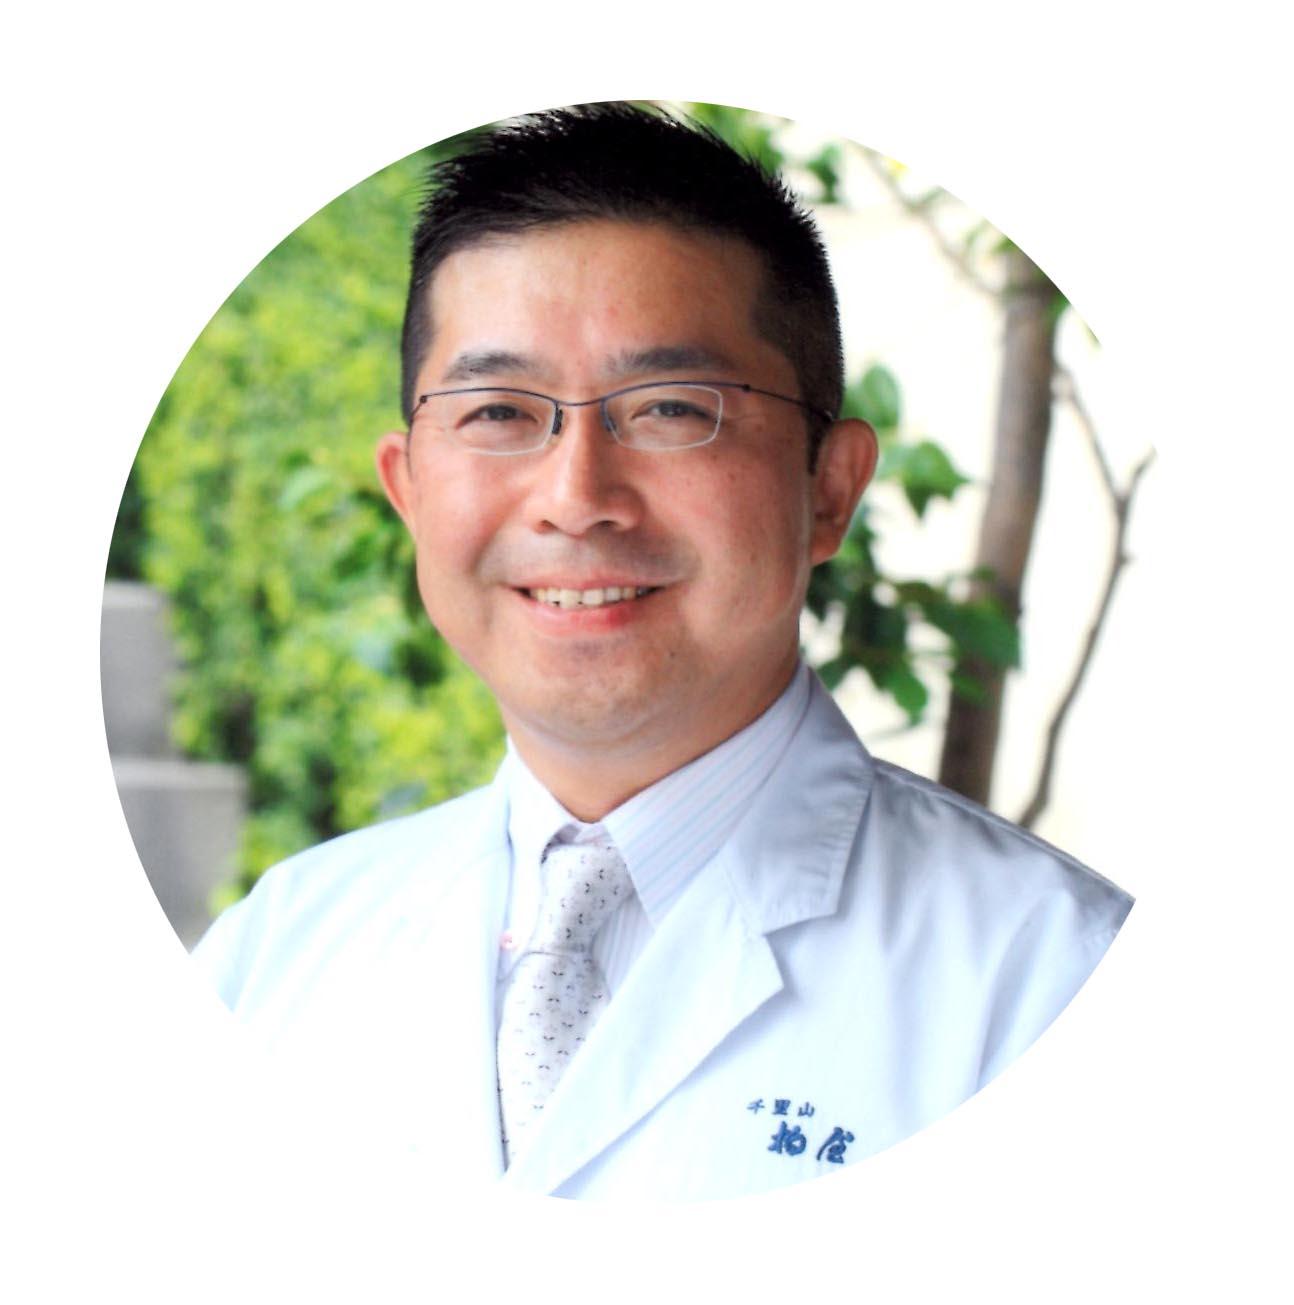 https://robert-parker-michelin-hk-prod.s3.amazonaws.com/media/image/2017/09/29/a4b104747b844122aafbf568c24969aa_Hideaki+Matsuo.jpg